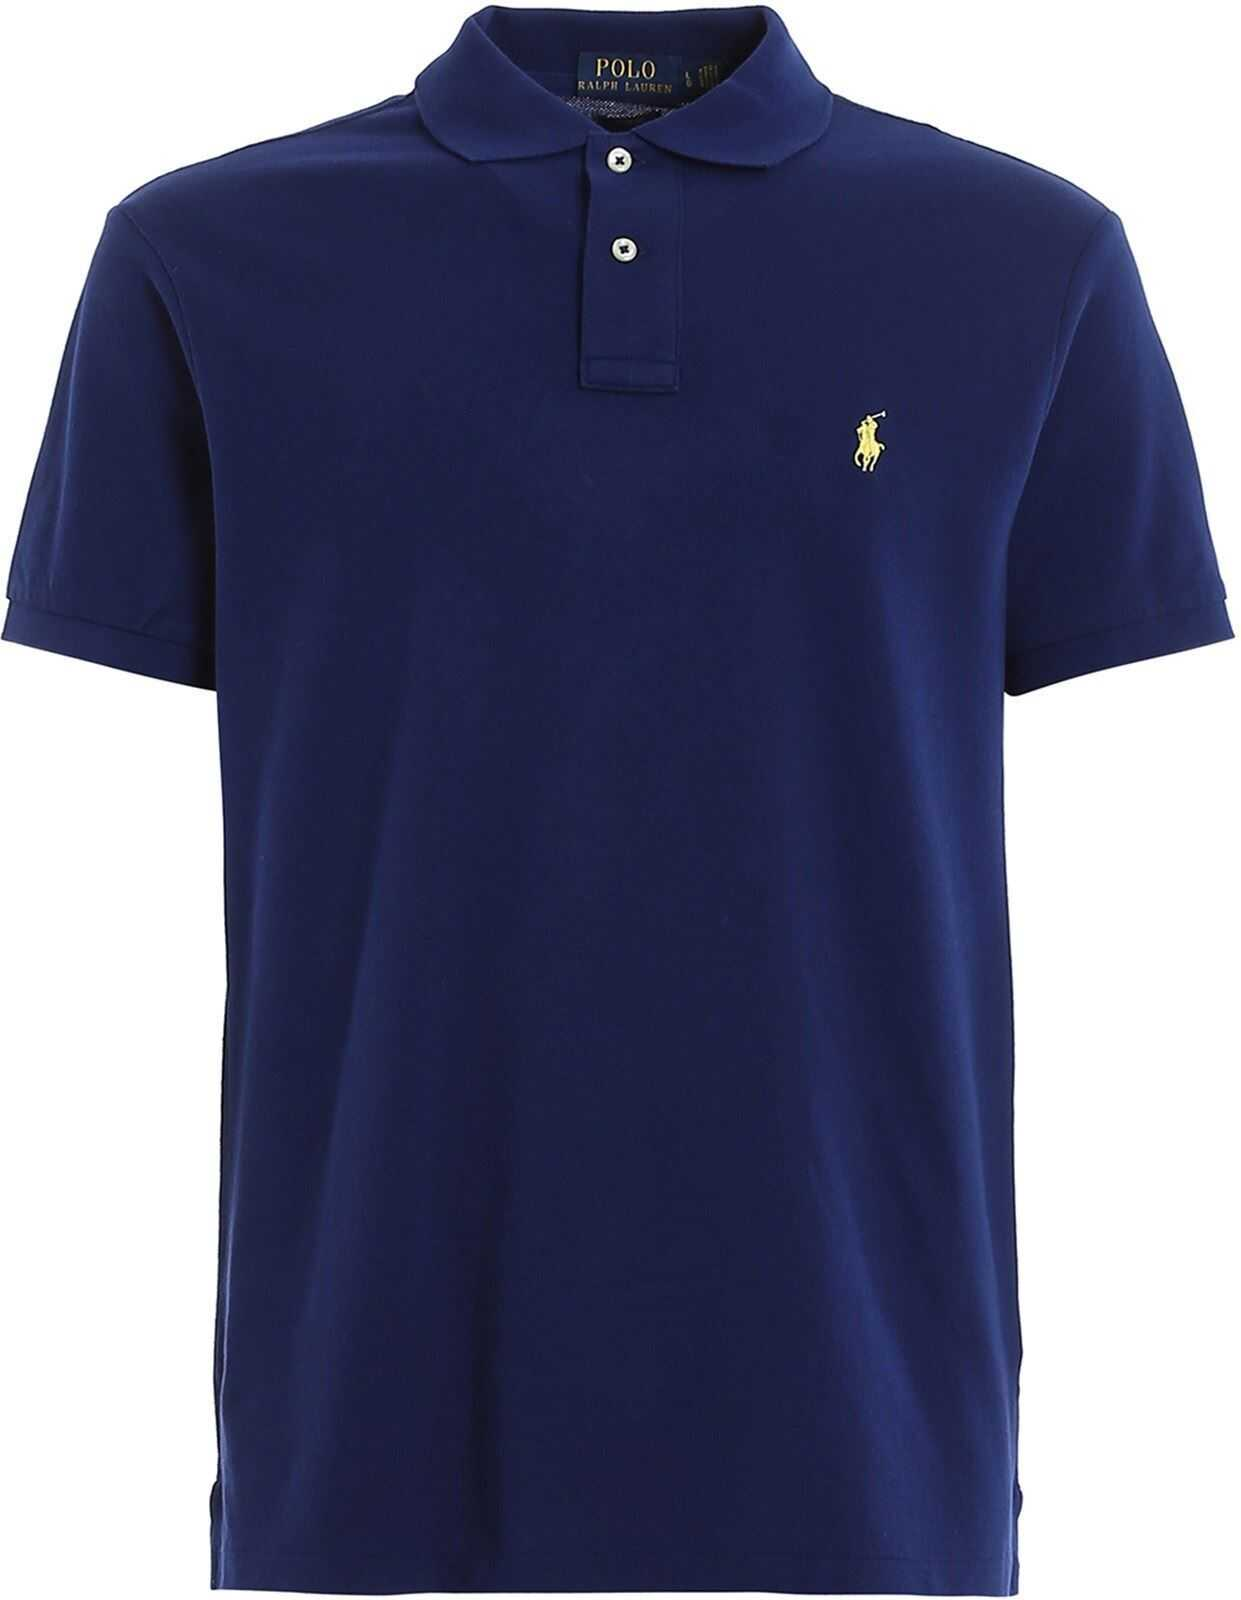 Ralph Lauren Dark Blue Slim Fit Cotton Pique Polo Blue imagine